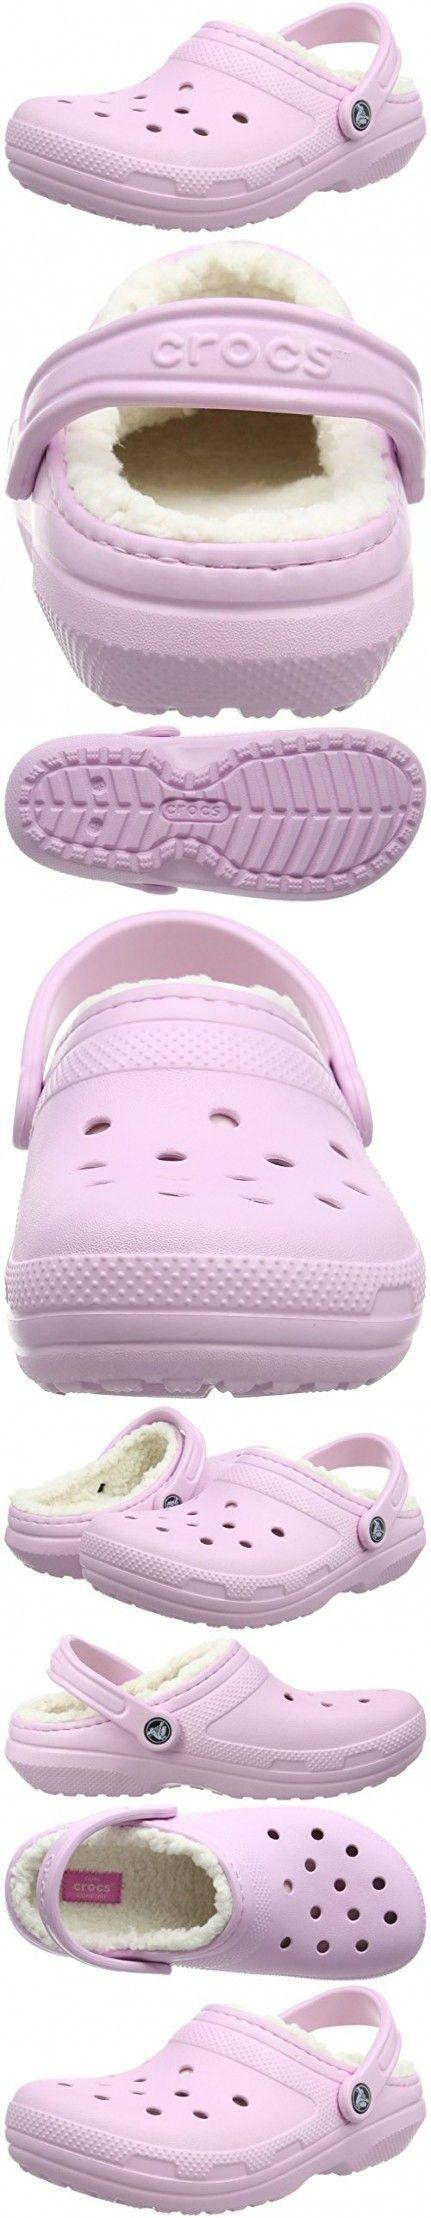 Crocs Women's Classic Lined Clog Mule, Ballerina Pink/Oatmeal, 8 US Men's/10 US Women's